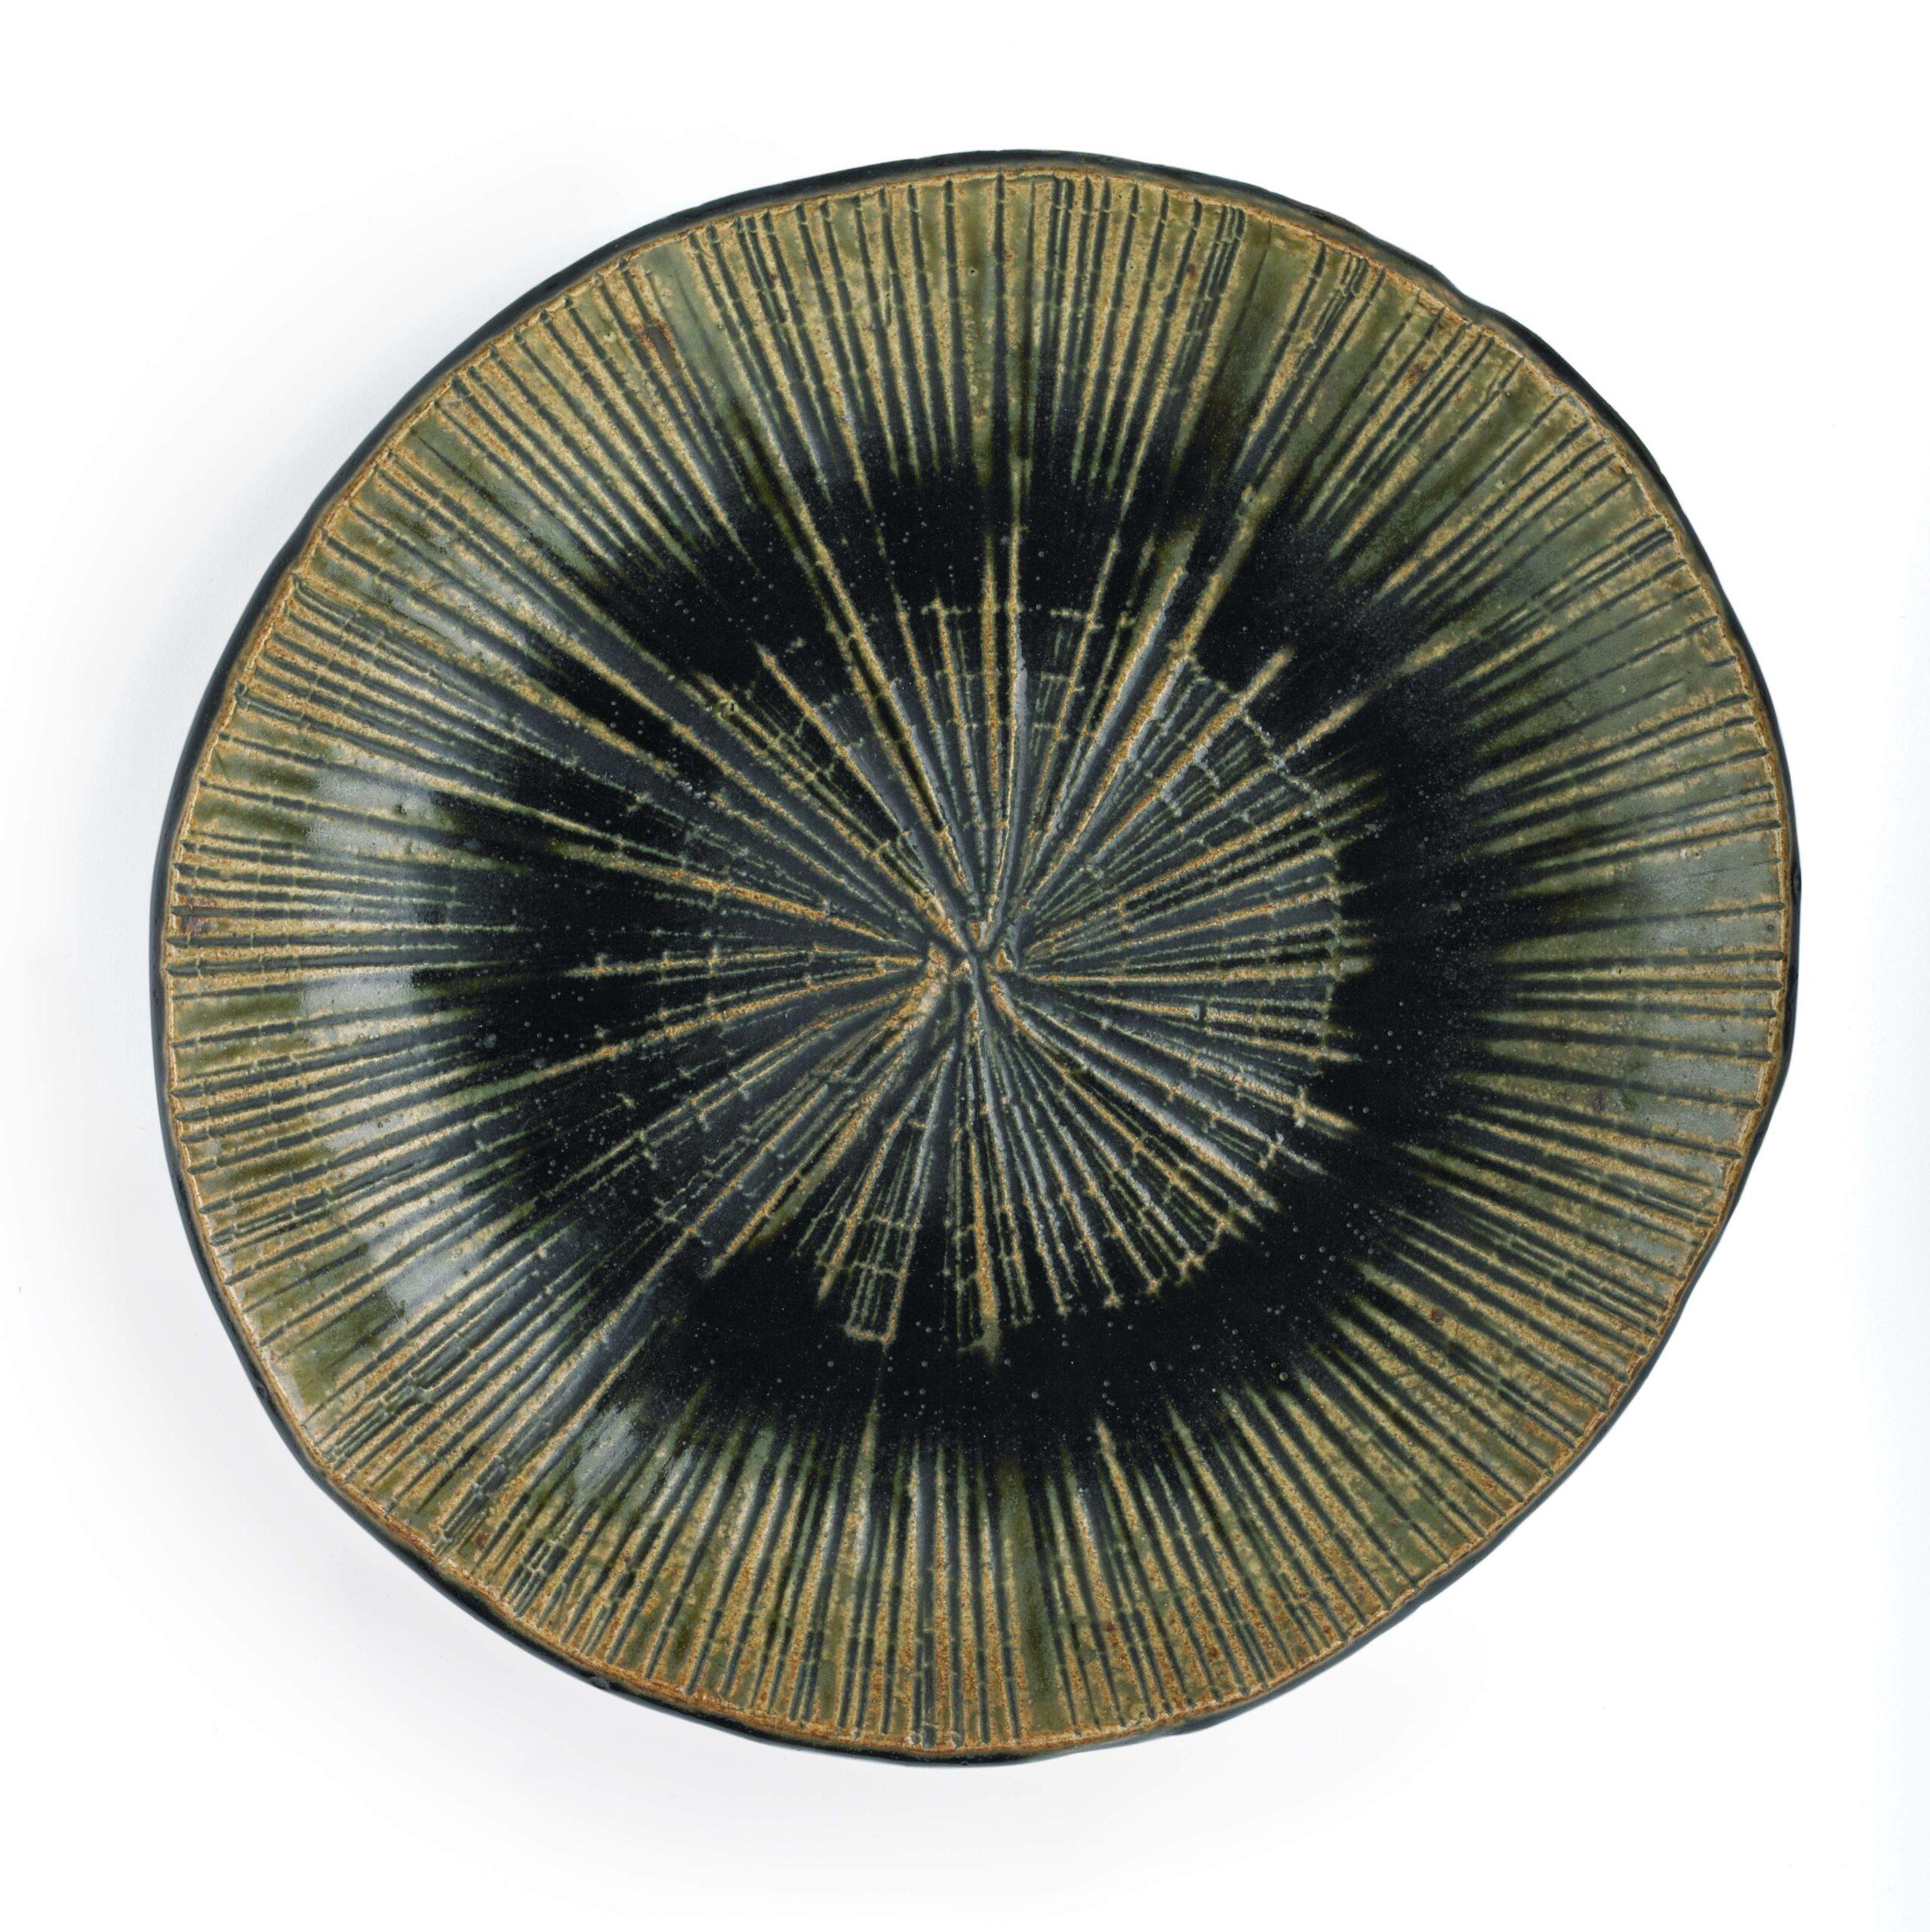 DISH by KATO Shigetaka (1927-2013)  Showa period, 1970/80s Oribe stoneware